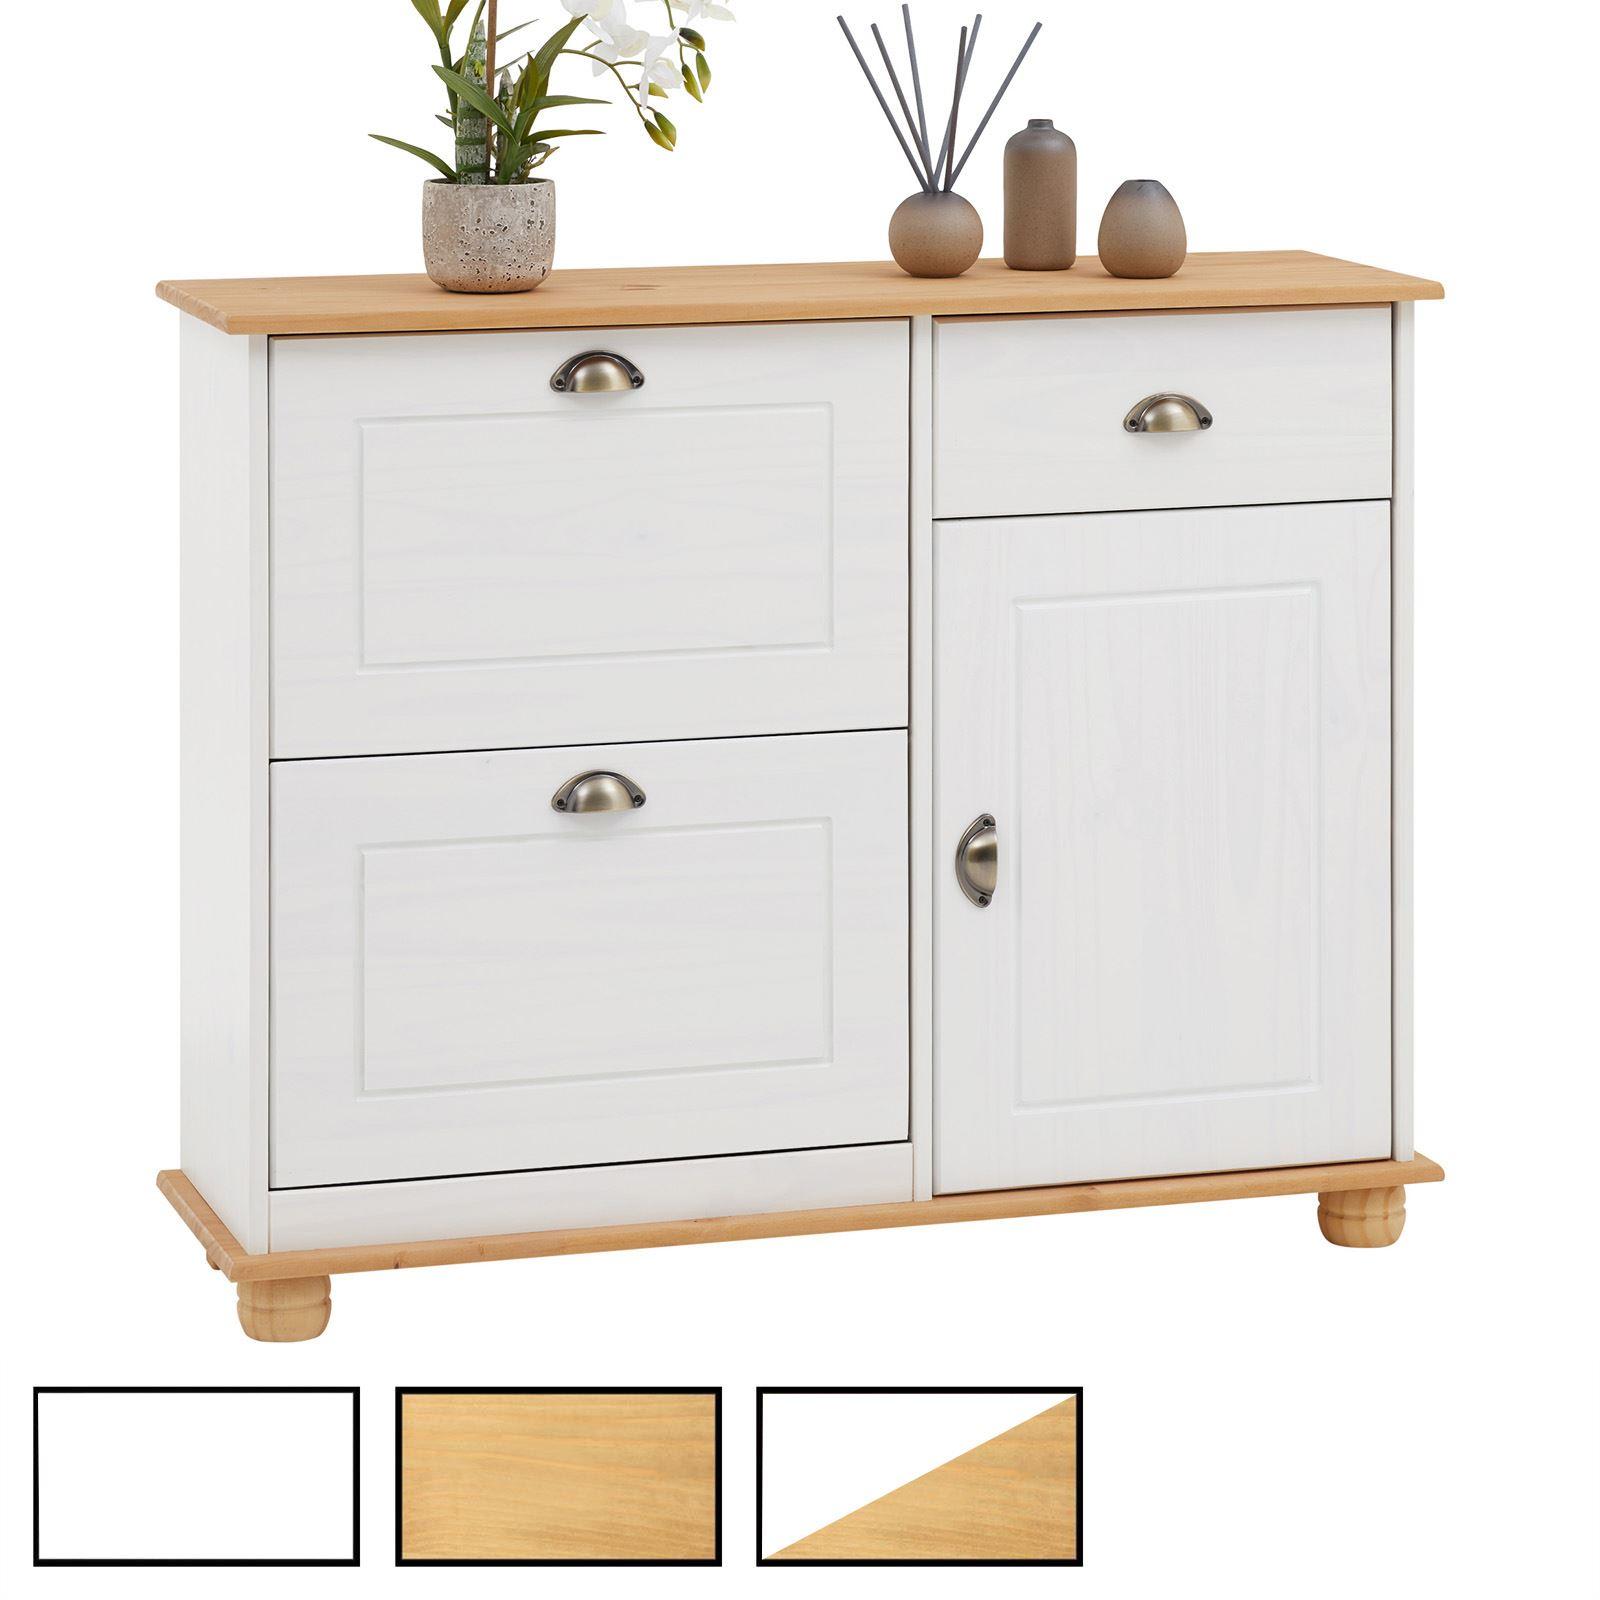 schuhschrank colmar in 2 farbvarianten mobilia24. Black Bedroom Furniture Sets. Home Design Ideas